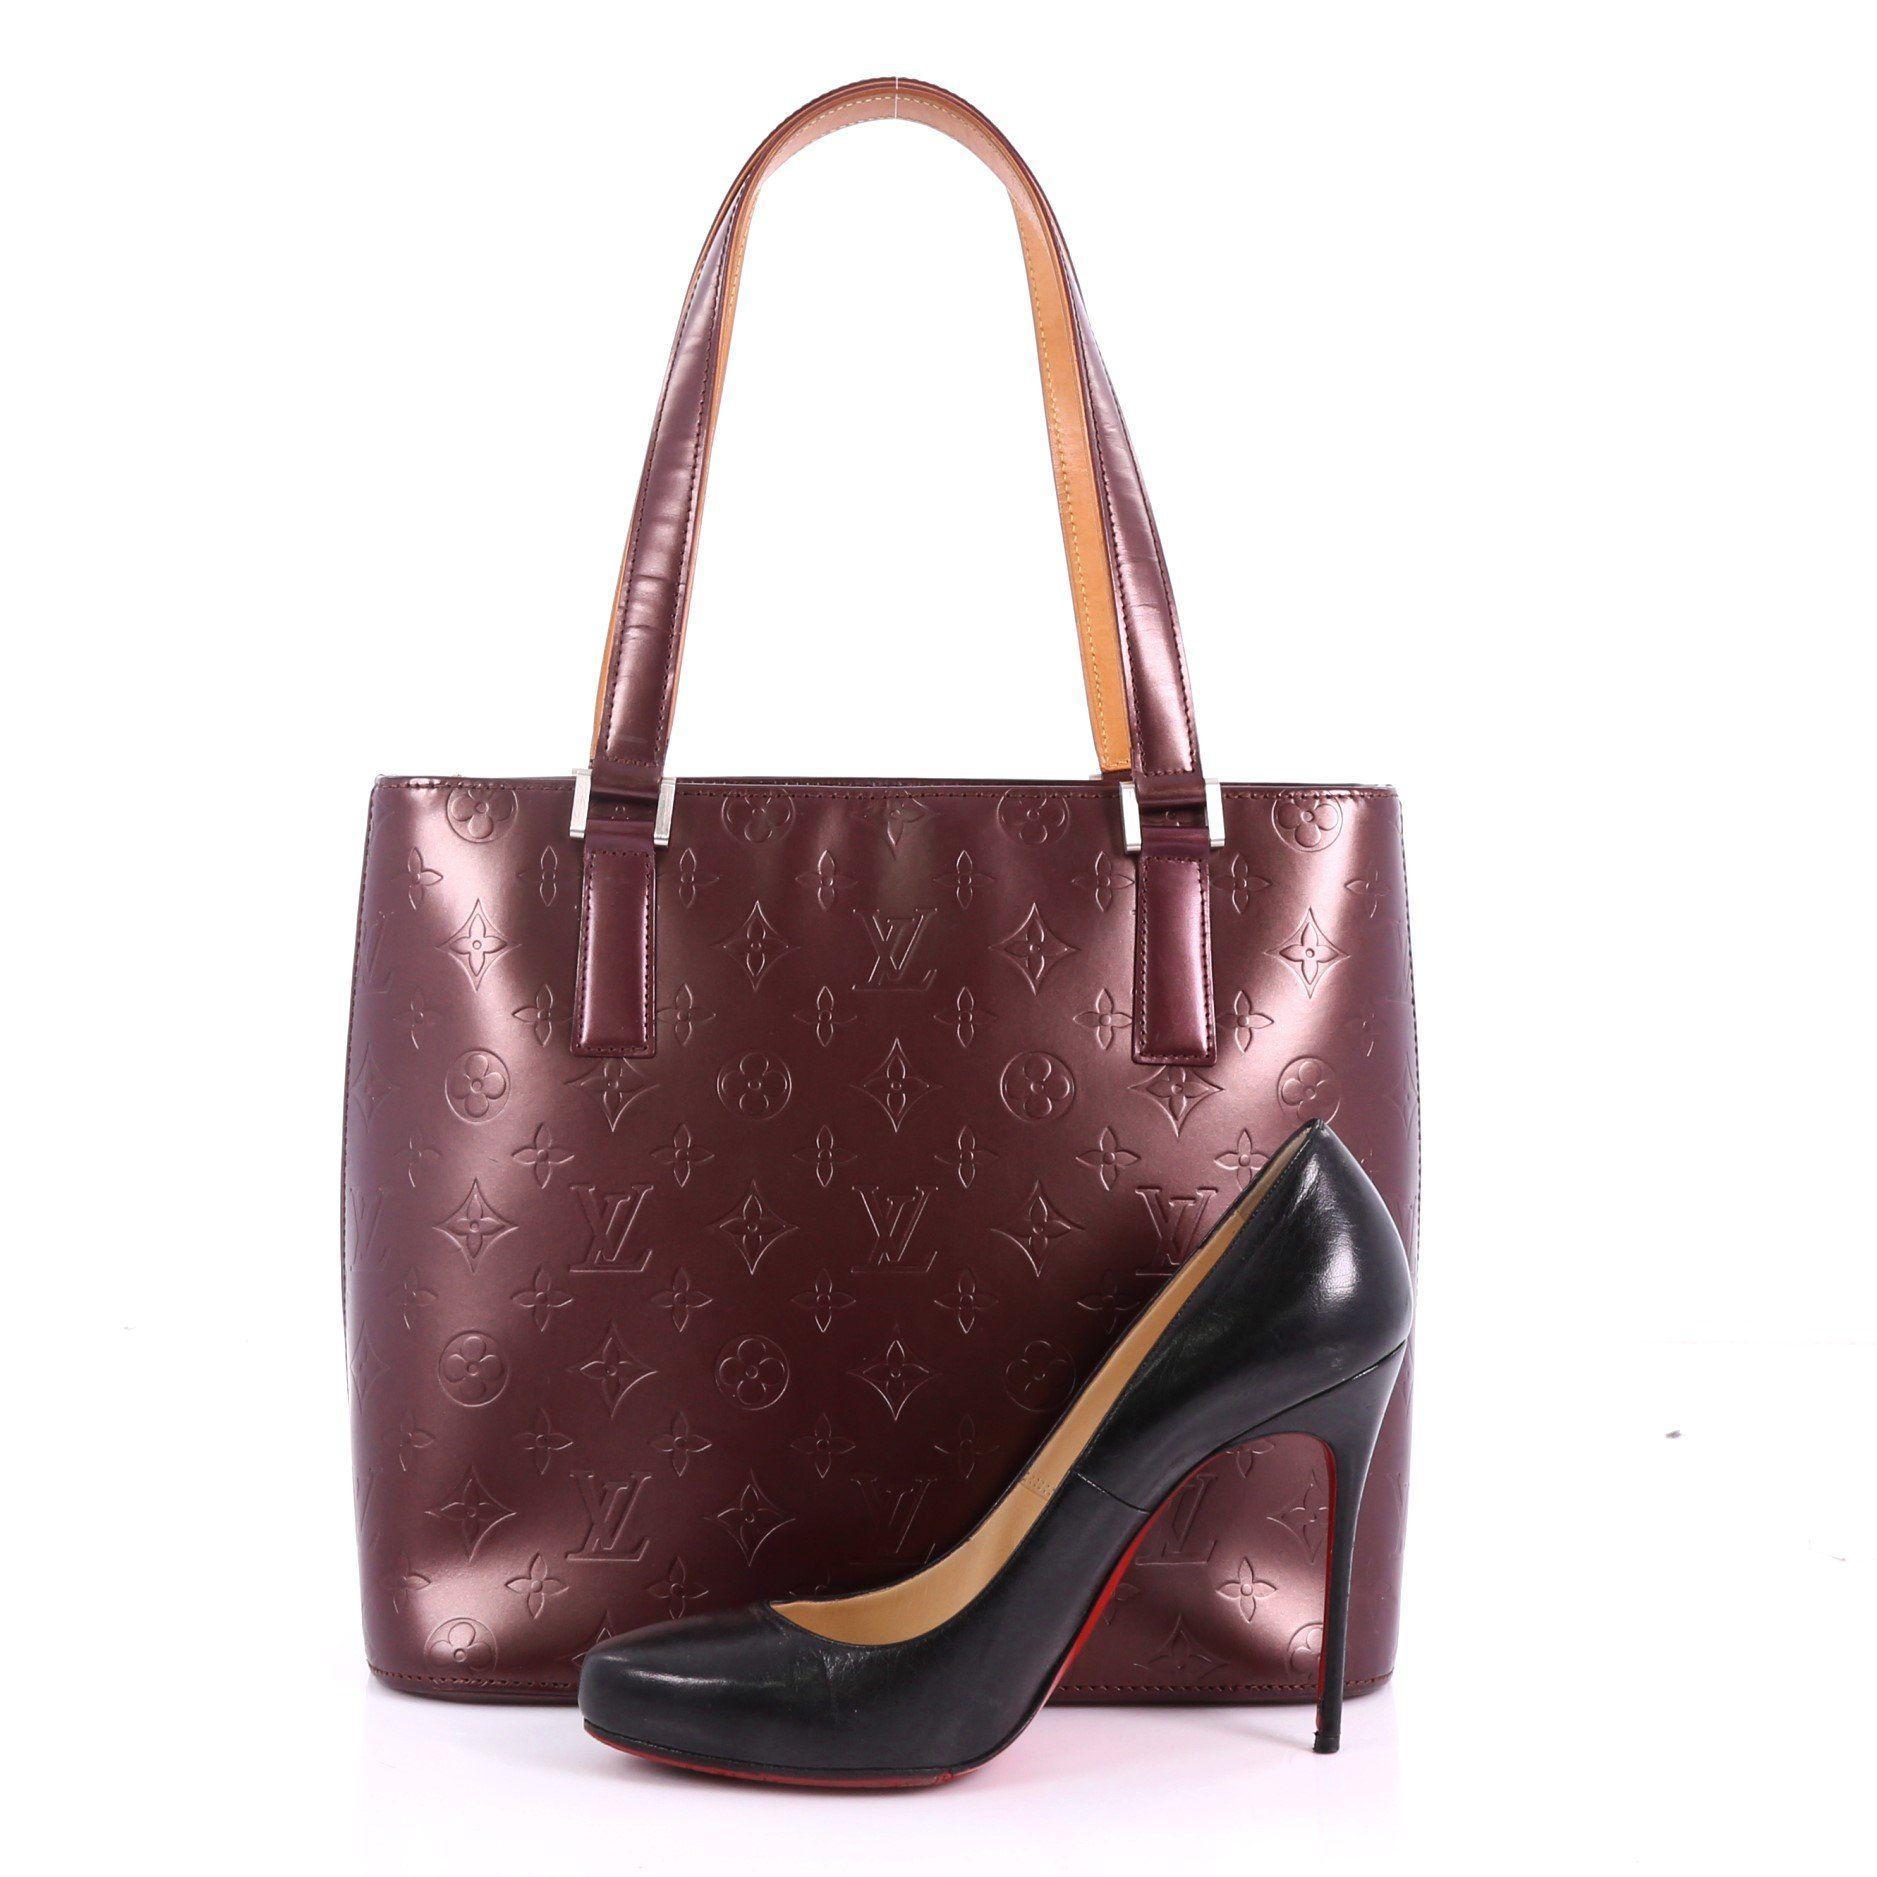 5f6a2f8718f8 Louis Vuitton - Multicolor Pre Owned Mat Stockton Handbag Monogram Vernis -  Lyst. View fullscreen